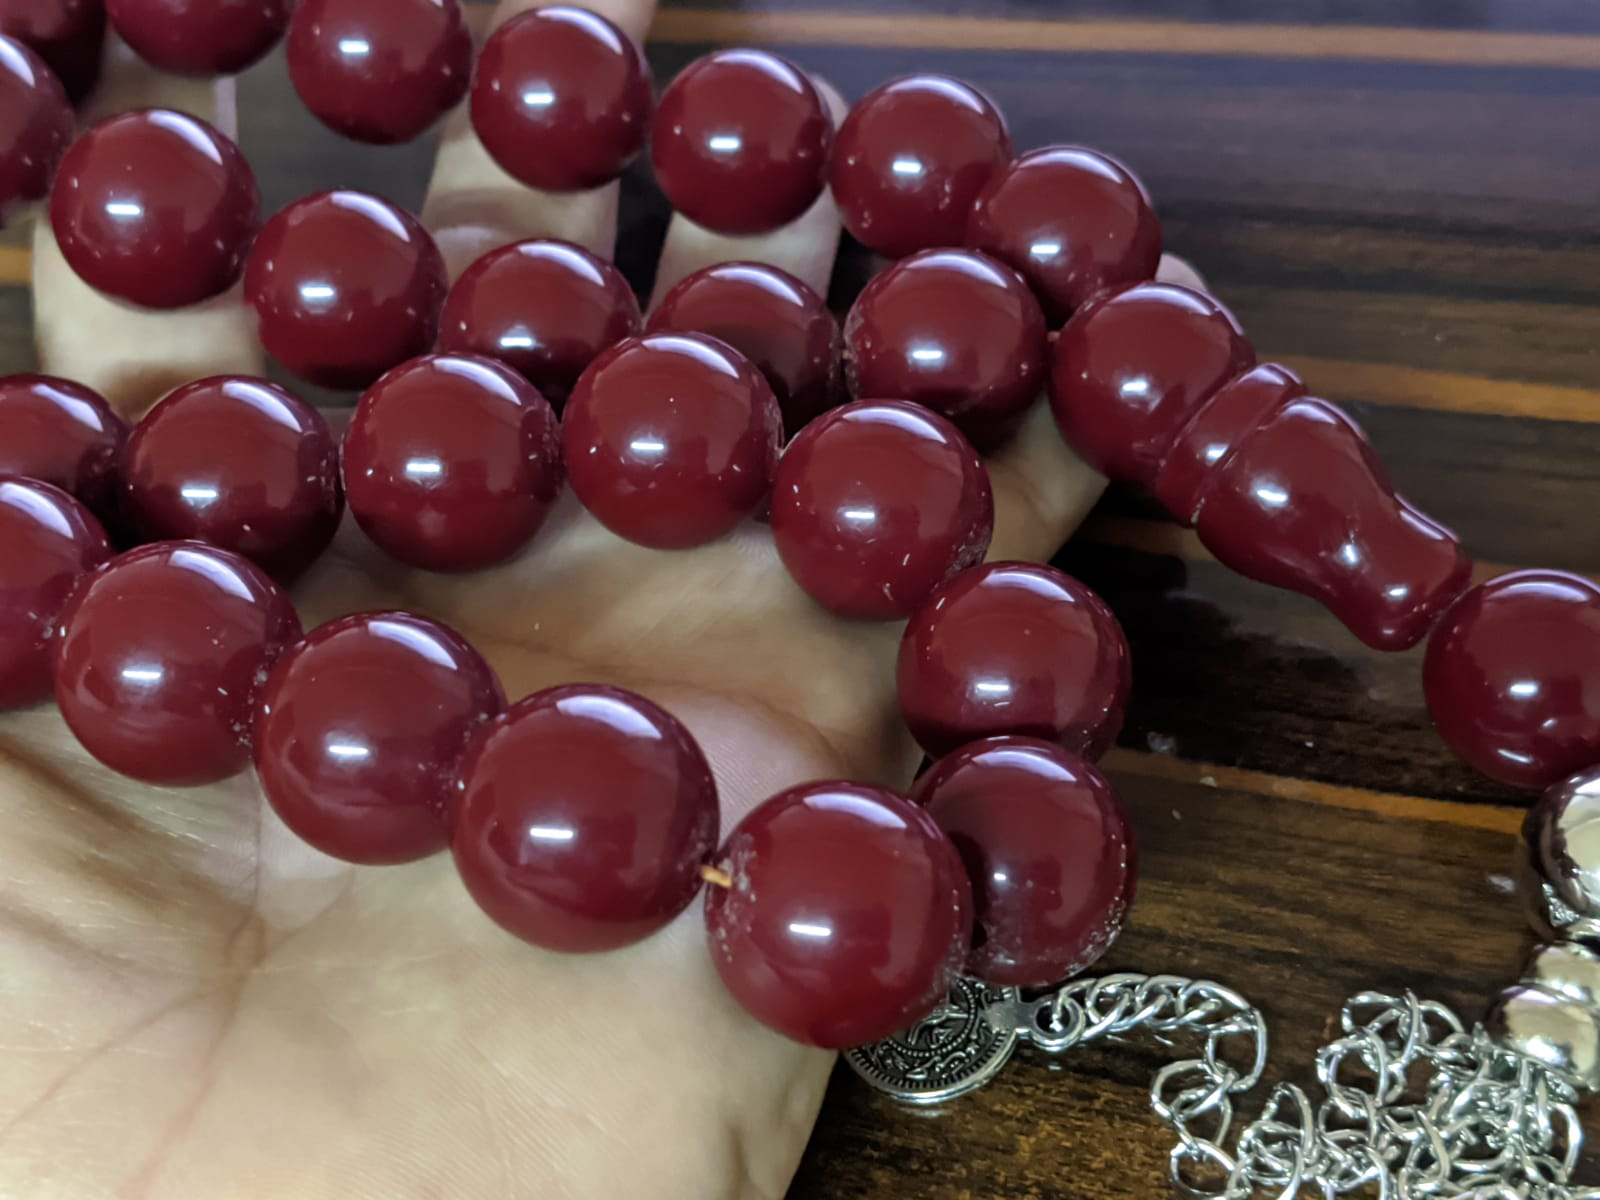 Ottoman Faturan German Amber Sandalous Misbaha Prayer Beads Islamic Gift Tasbih Tasbeeh Tasbeh Rosary Tasbih # 36B